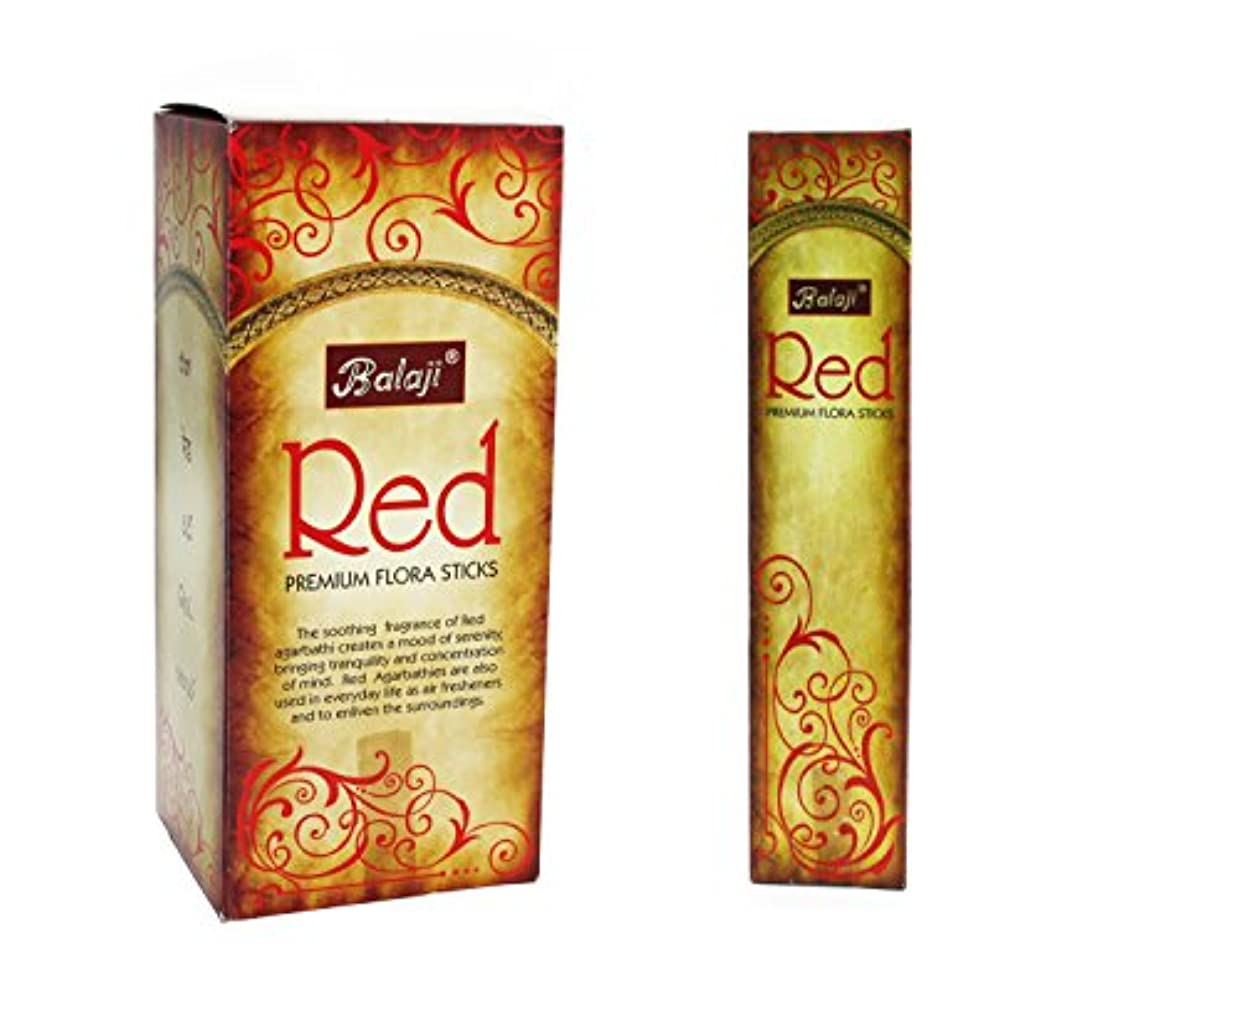 ペース計画的鏡Balaji Red Premium Flora Sticks (Incense/Joss Sticks/ Agarbatti) (12 units x 15 Sticks) by Balaji